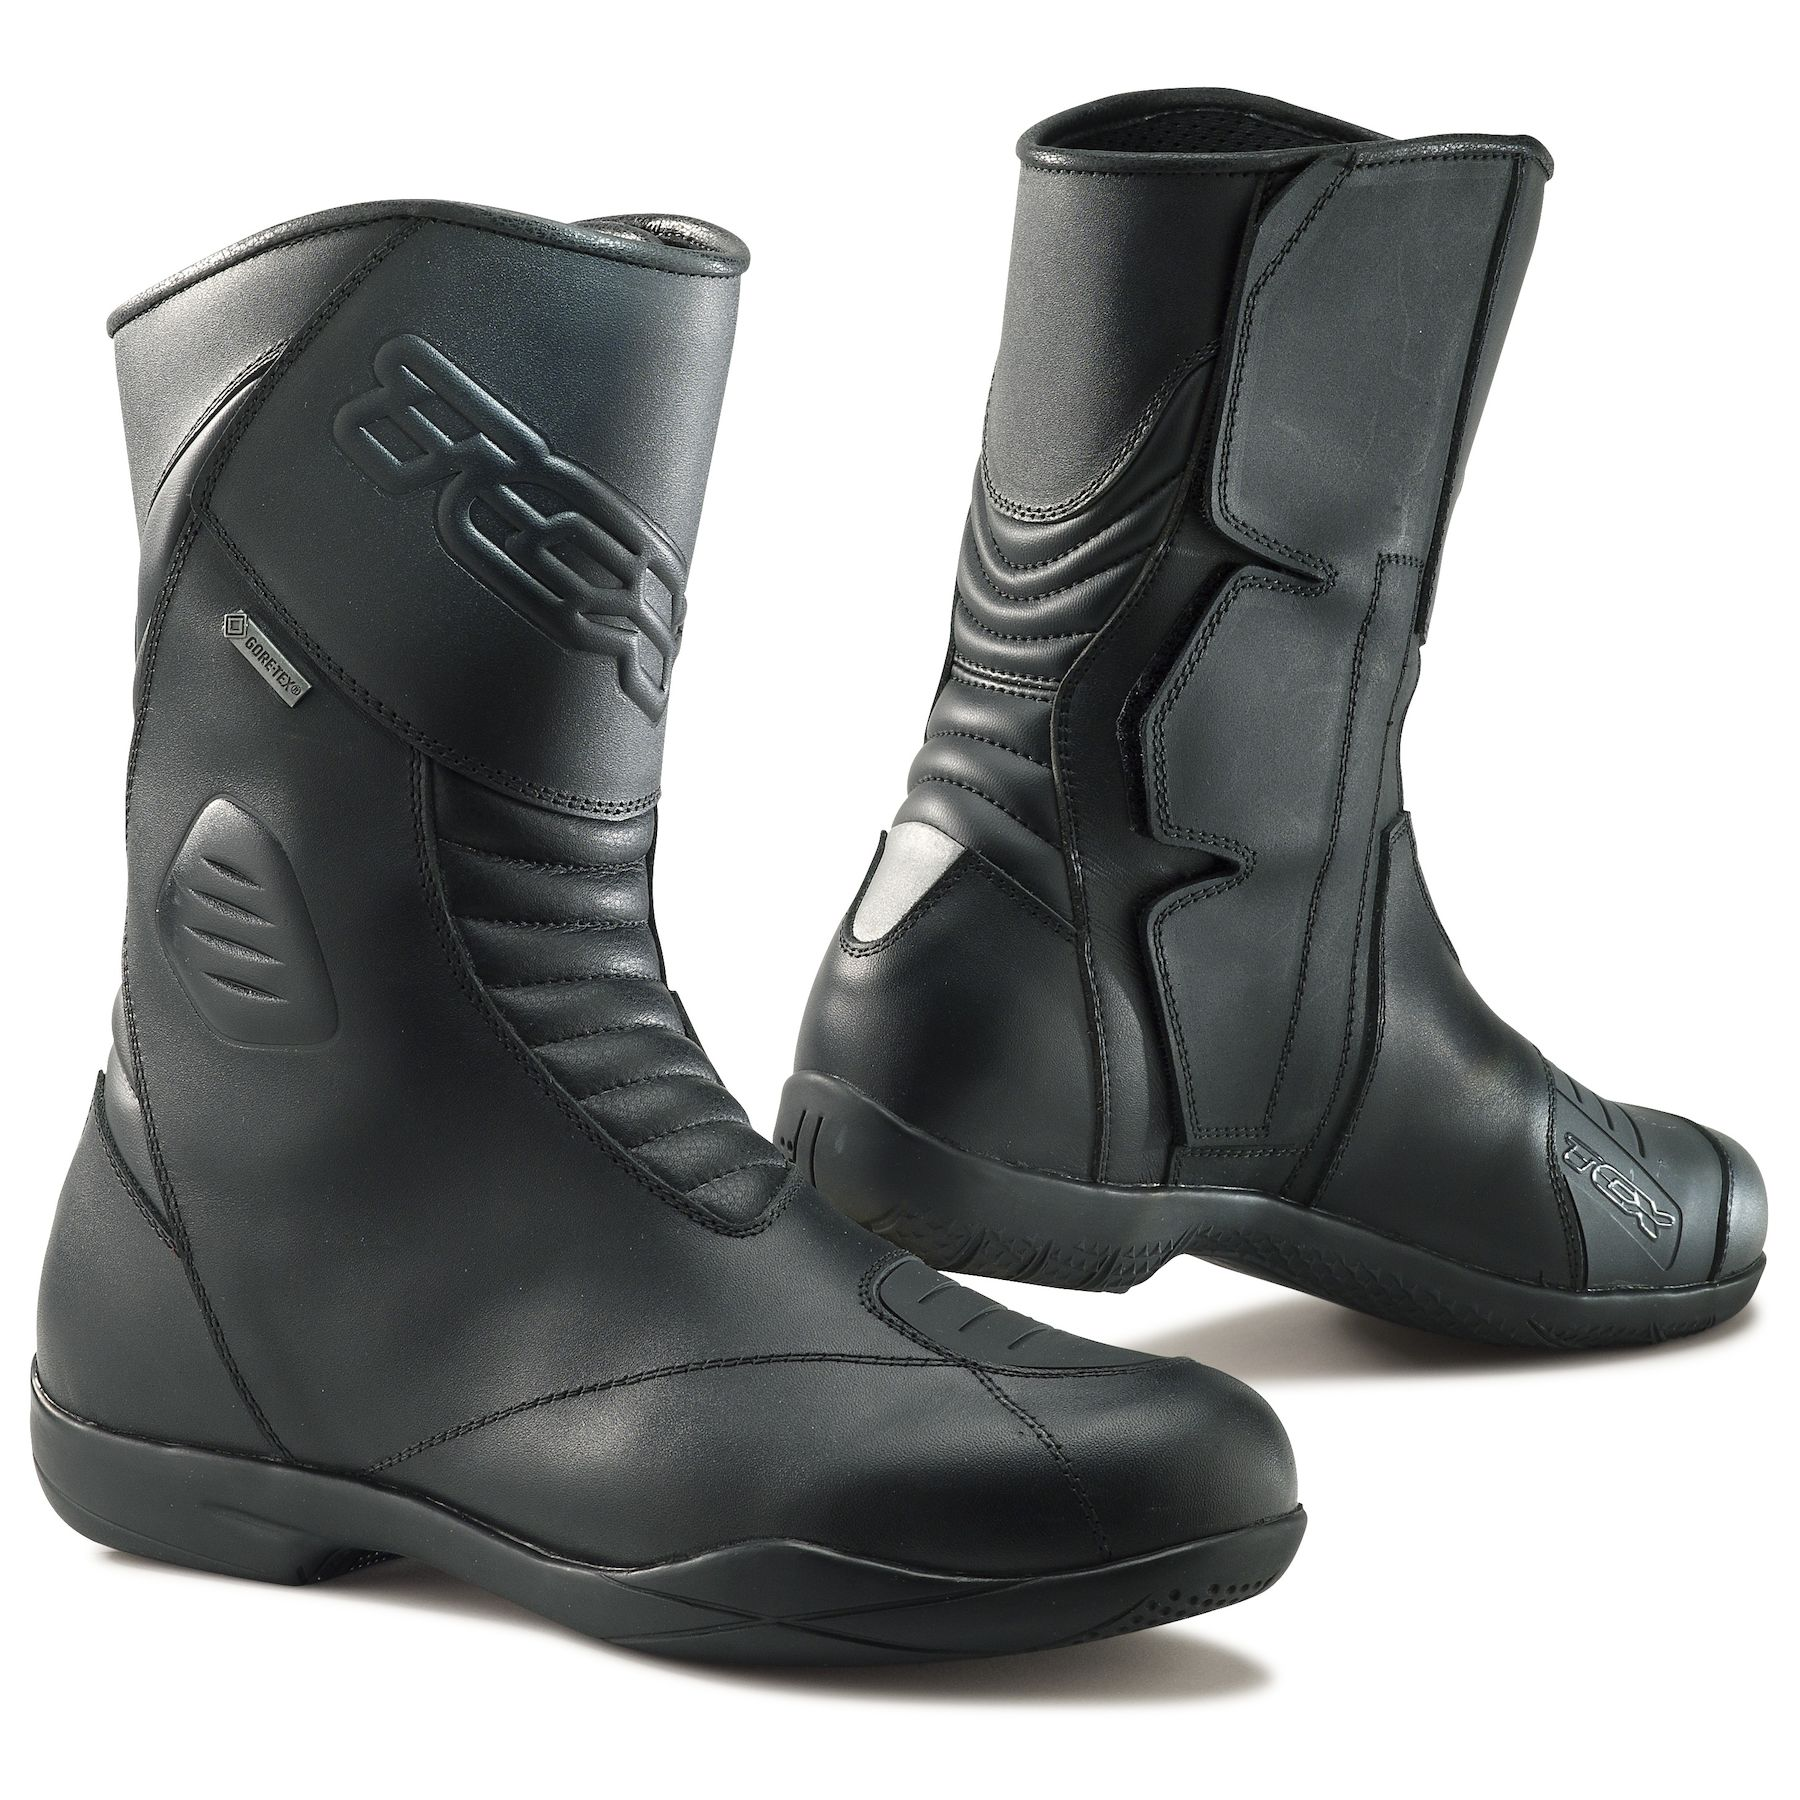 Tcx Gore Evo Boots Tex Five X nwP80XOk